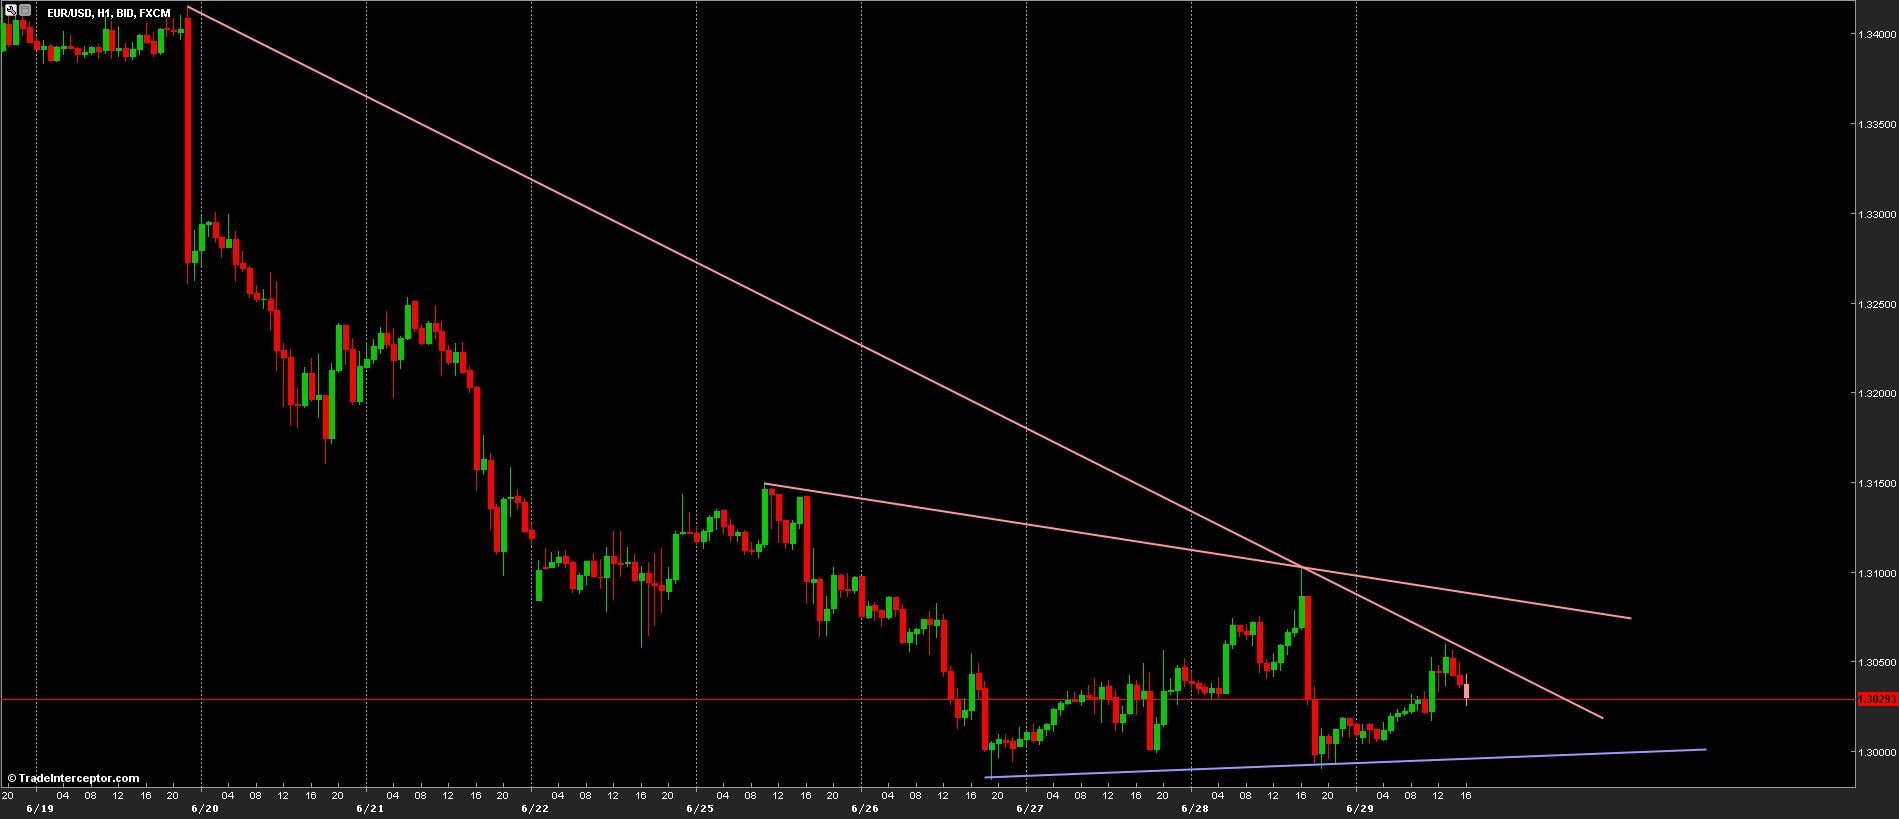 EUR/USD Chart 01/07/2013